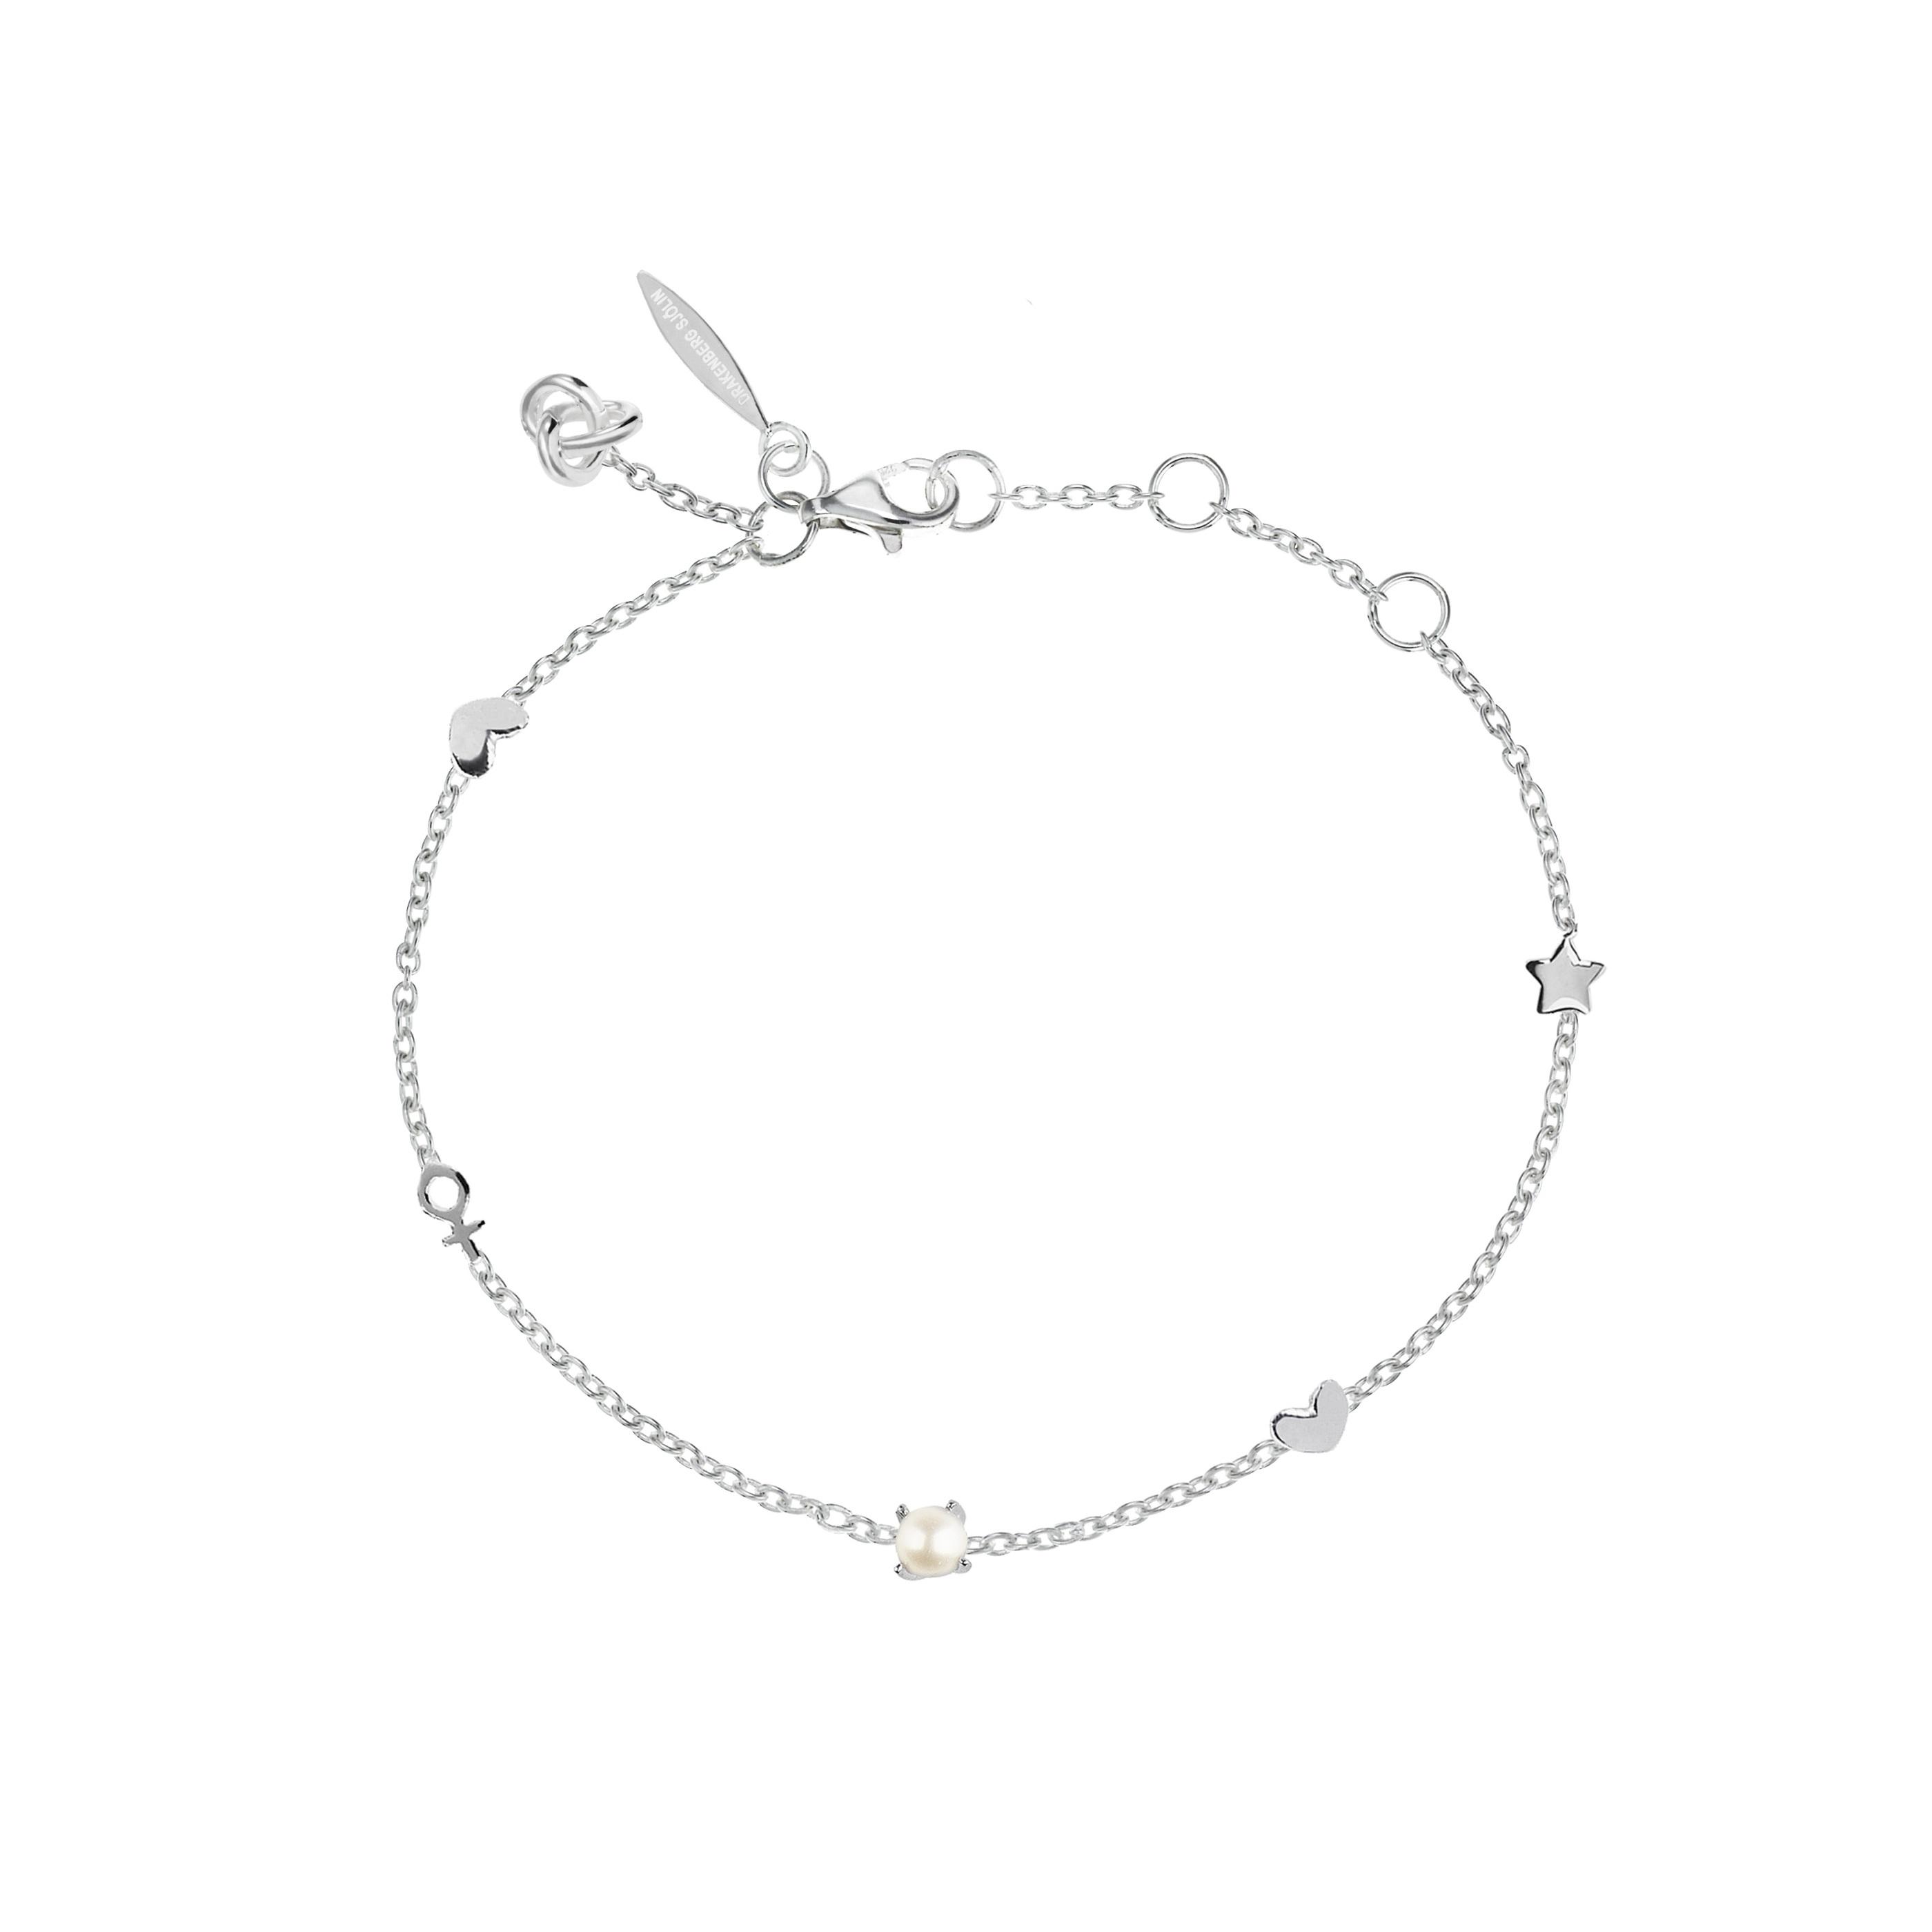 Petite Treasure bracelet